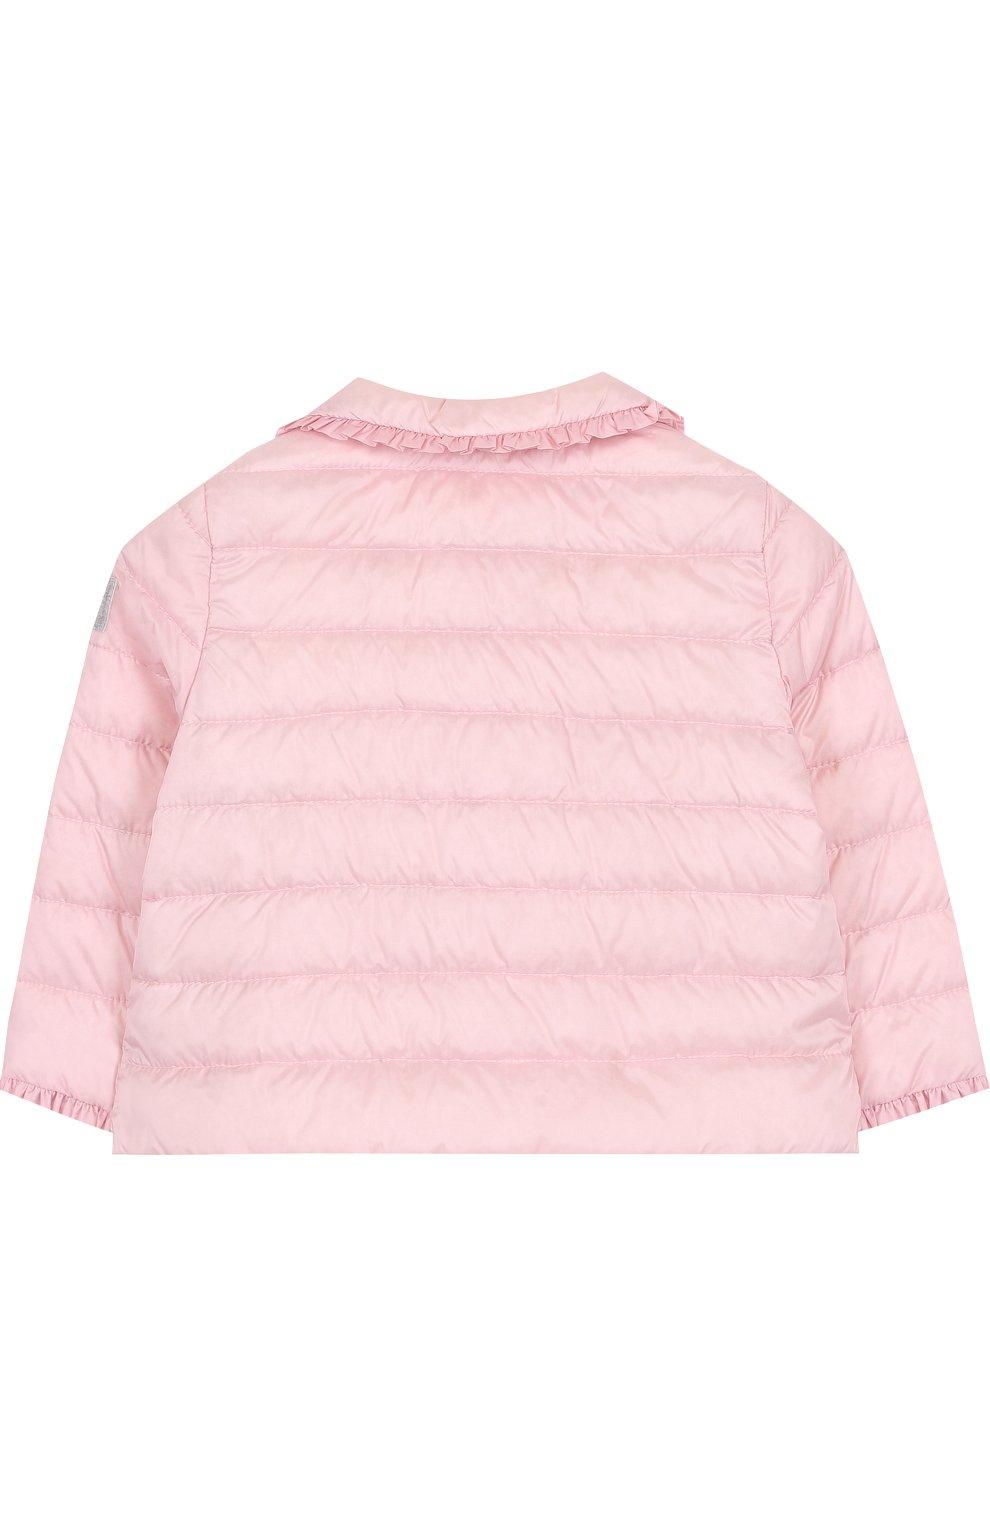 Детского пуховая куртка с оборками IL GUFO розового цвета, арт. P18GR108N0035/2A-4A   Фото 2